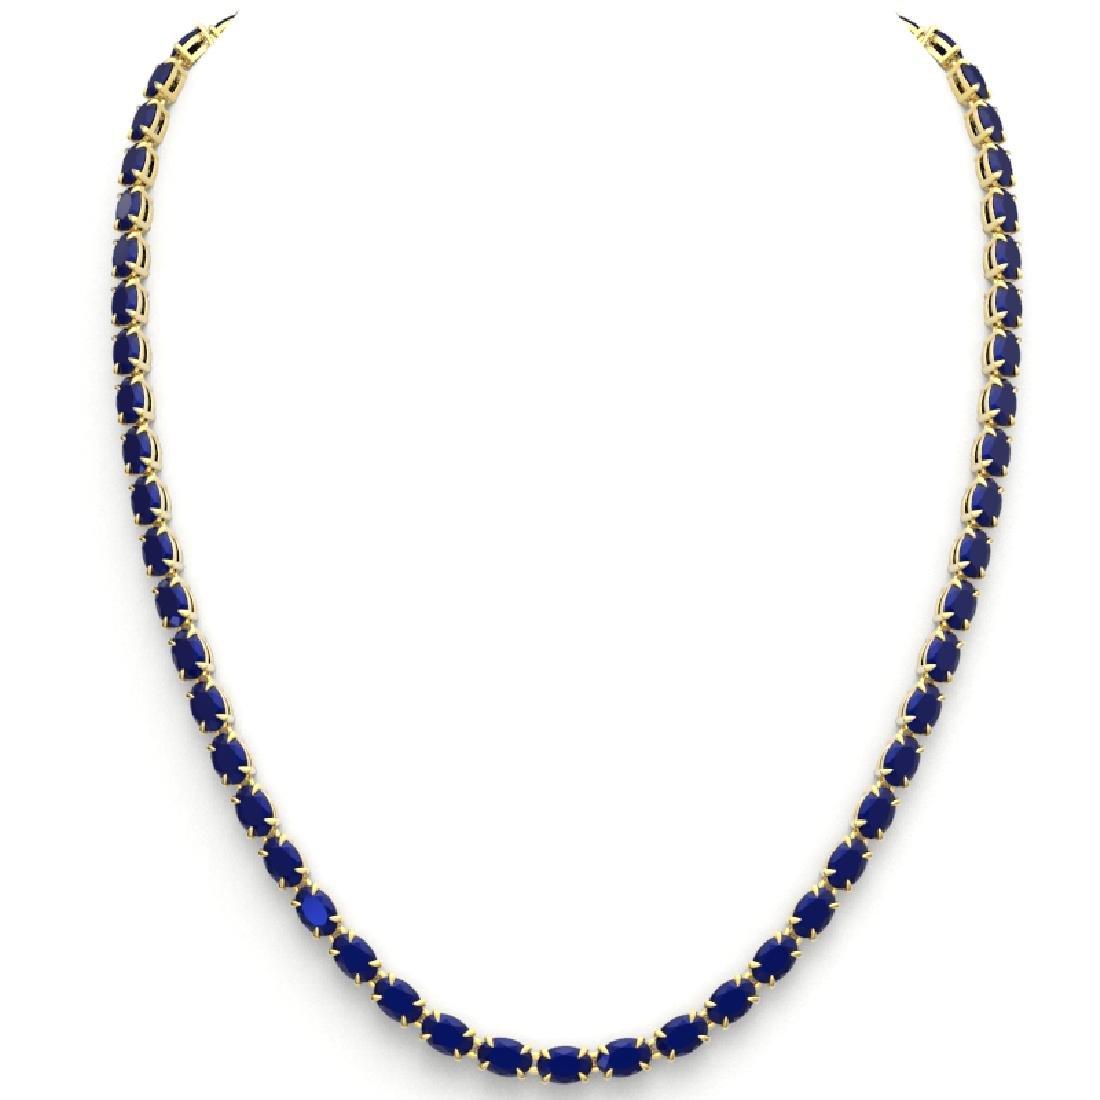 40 CTW Sapphire Eternity Tennis Necklace 14K Yellow - 3